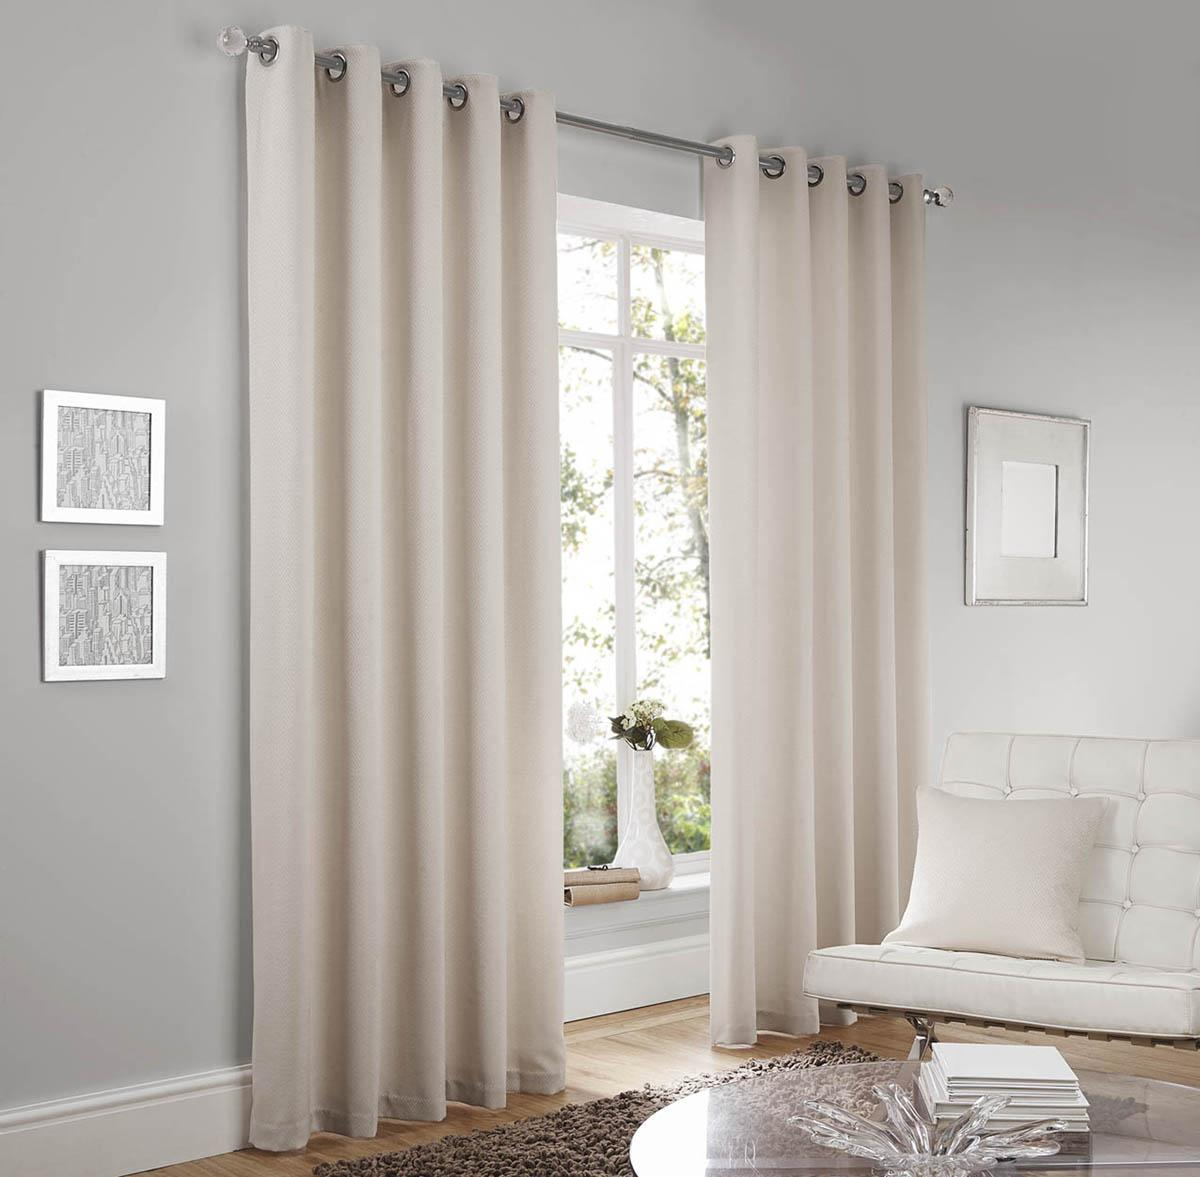 White Eyelet Curtains Uk Part - 23: Lincoln Ready Made Eyelet Curtains